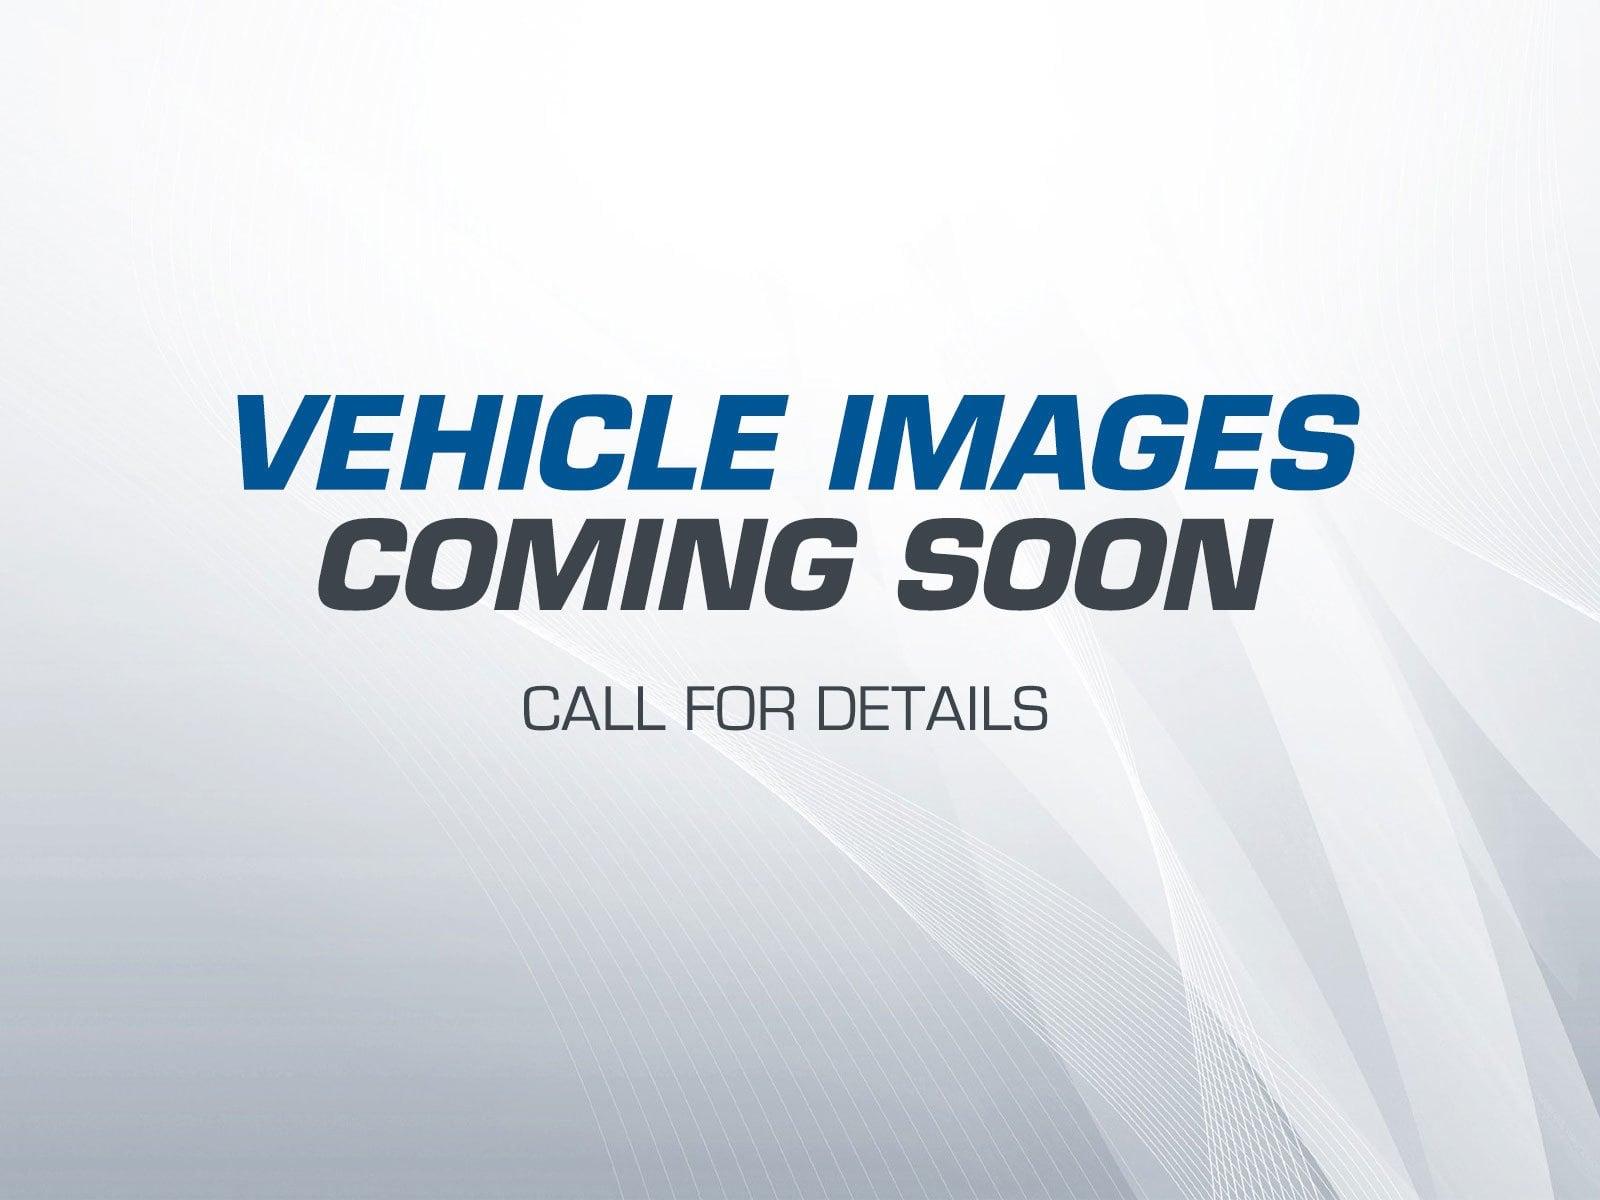 Photo 2015 INFINITI QX60 FWD 4dr SUV in Franklin, TN